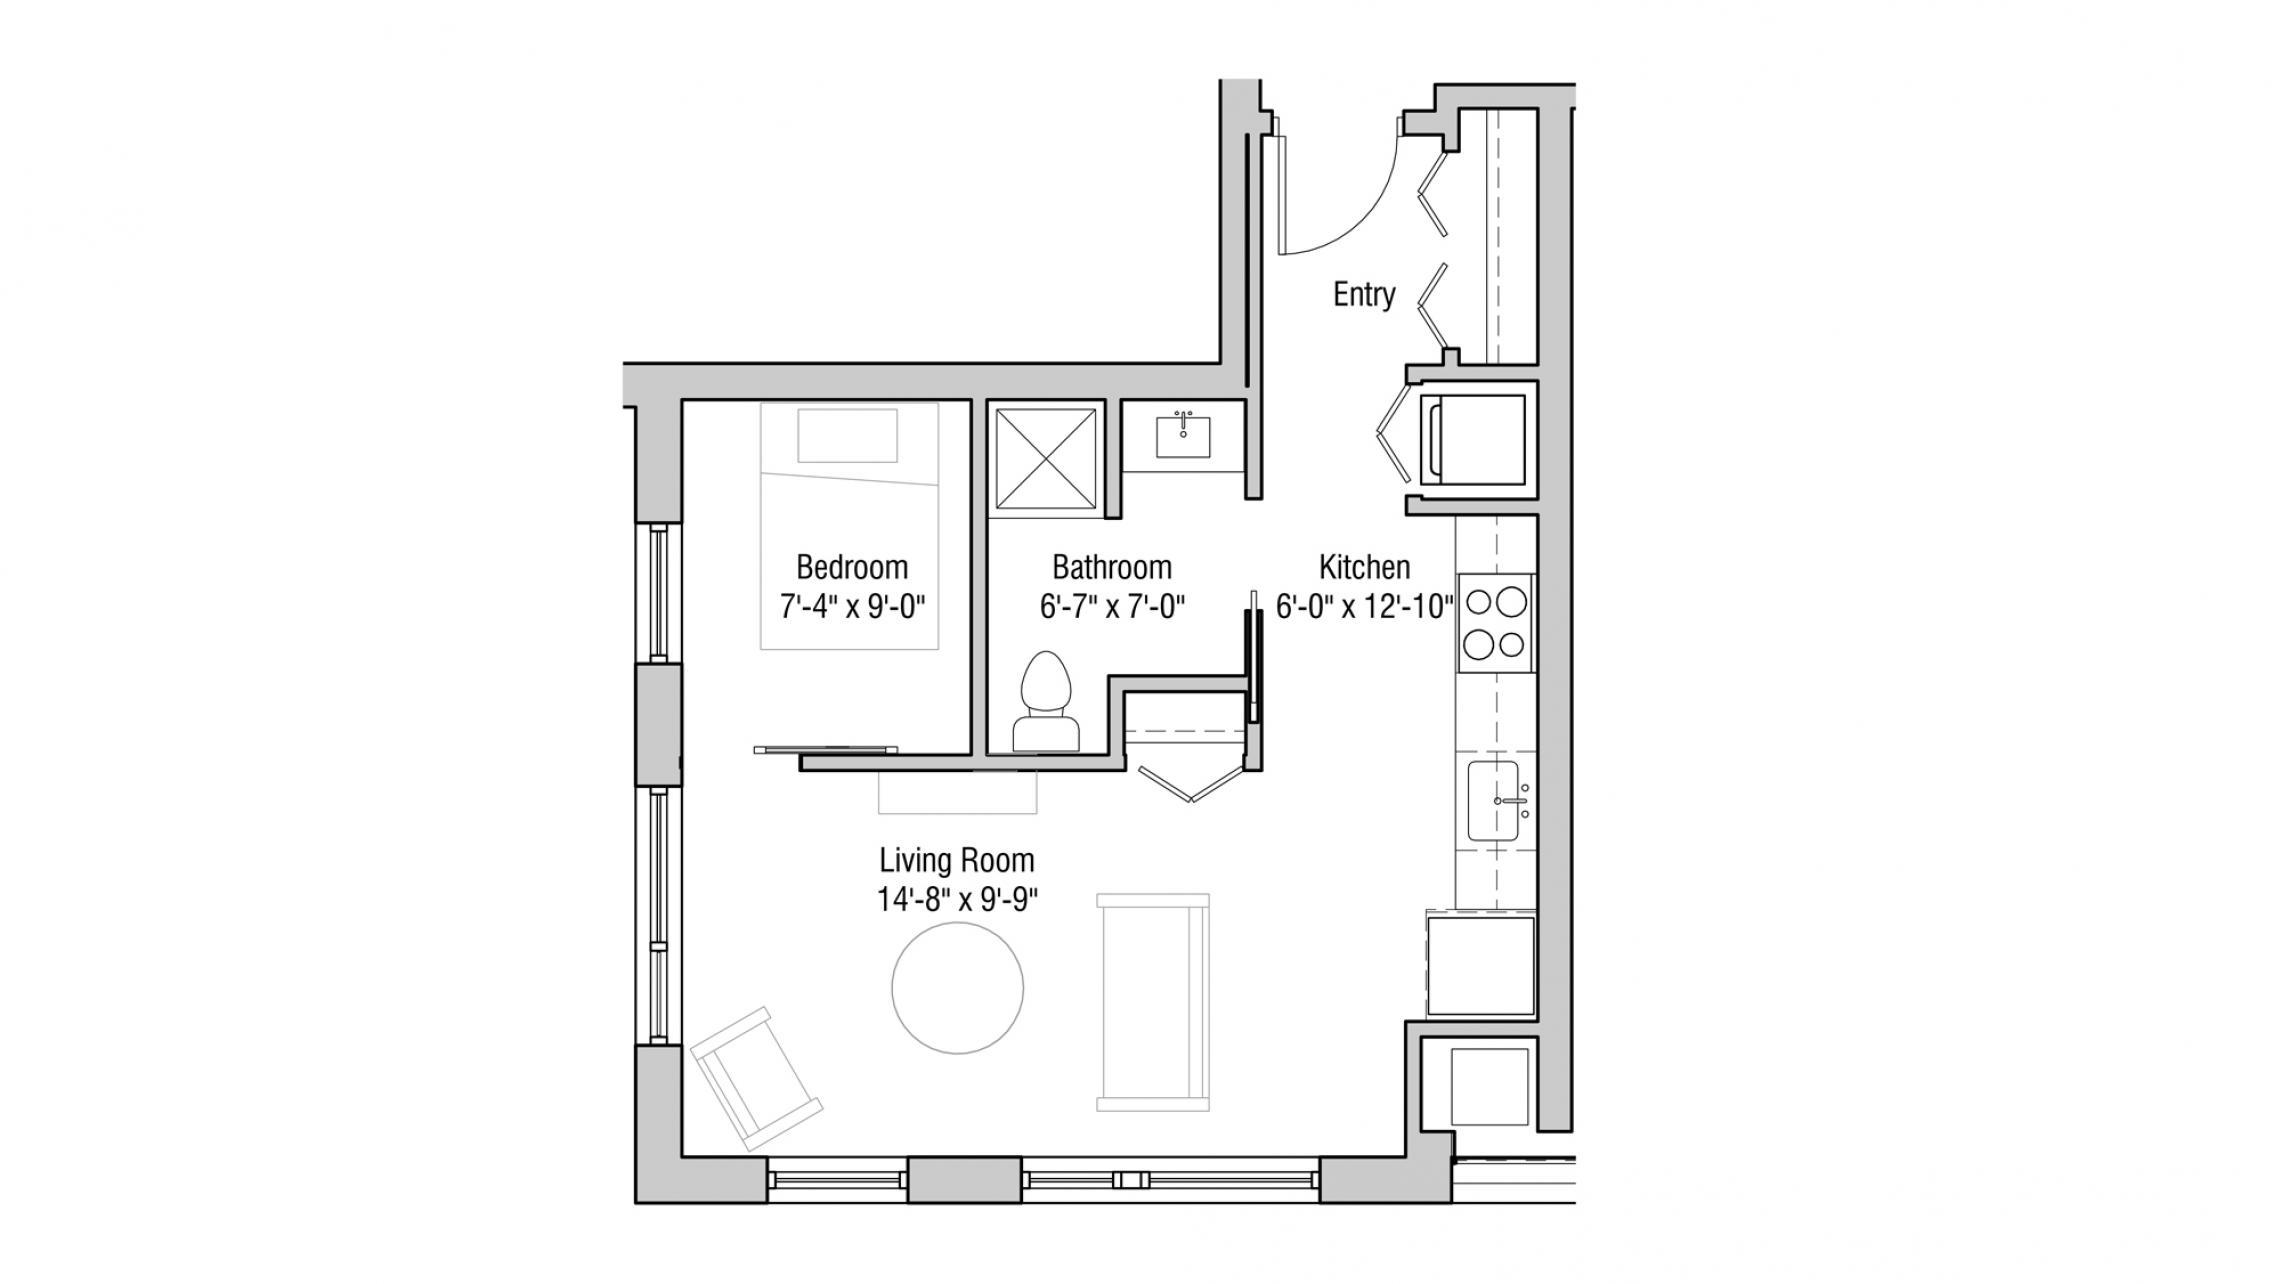 ULI Quarter Row 126 - Studio, One Bathroom